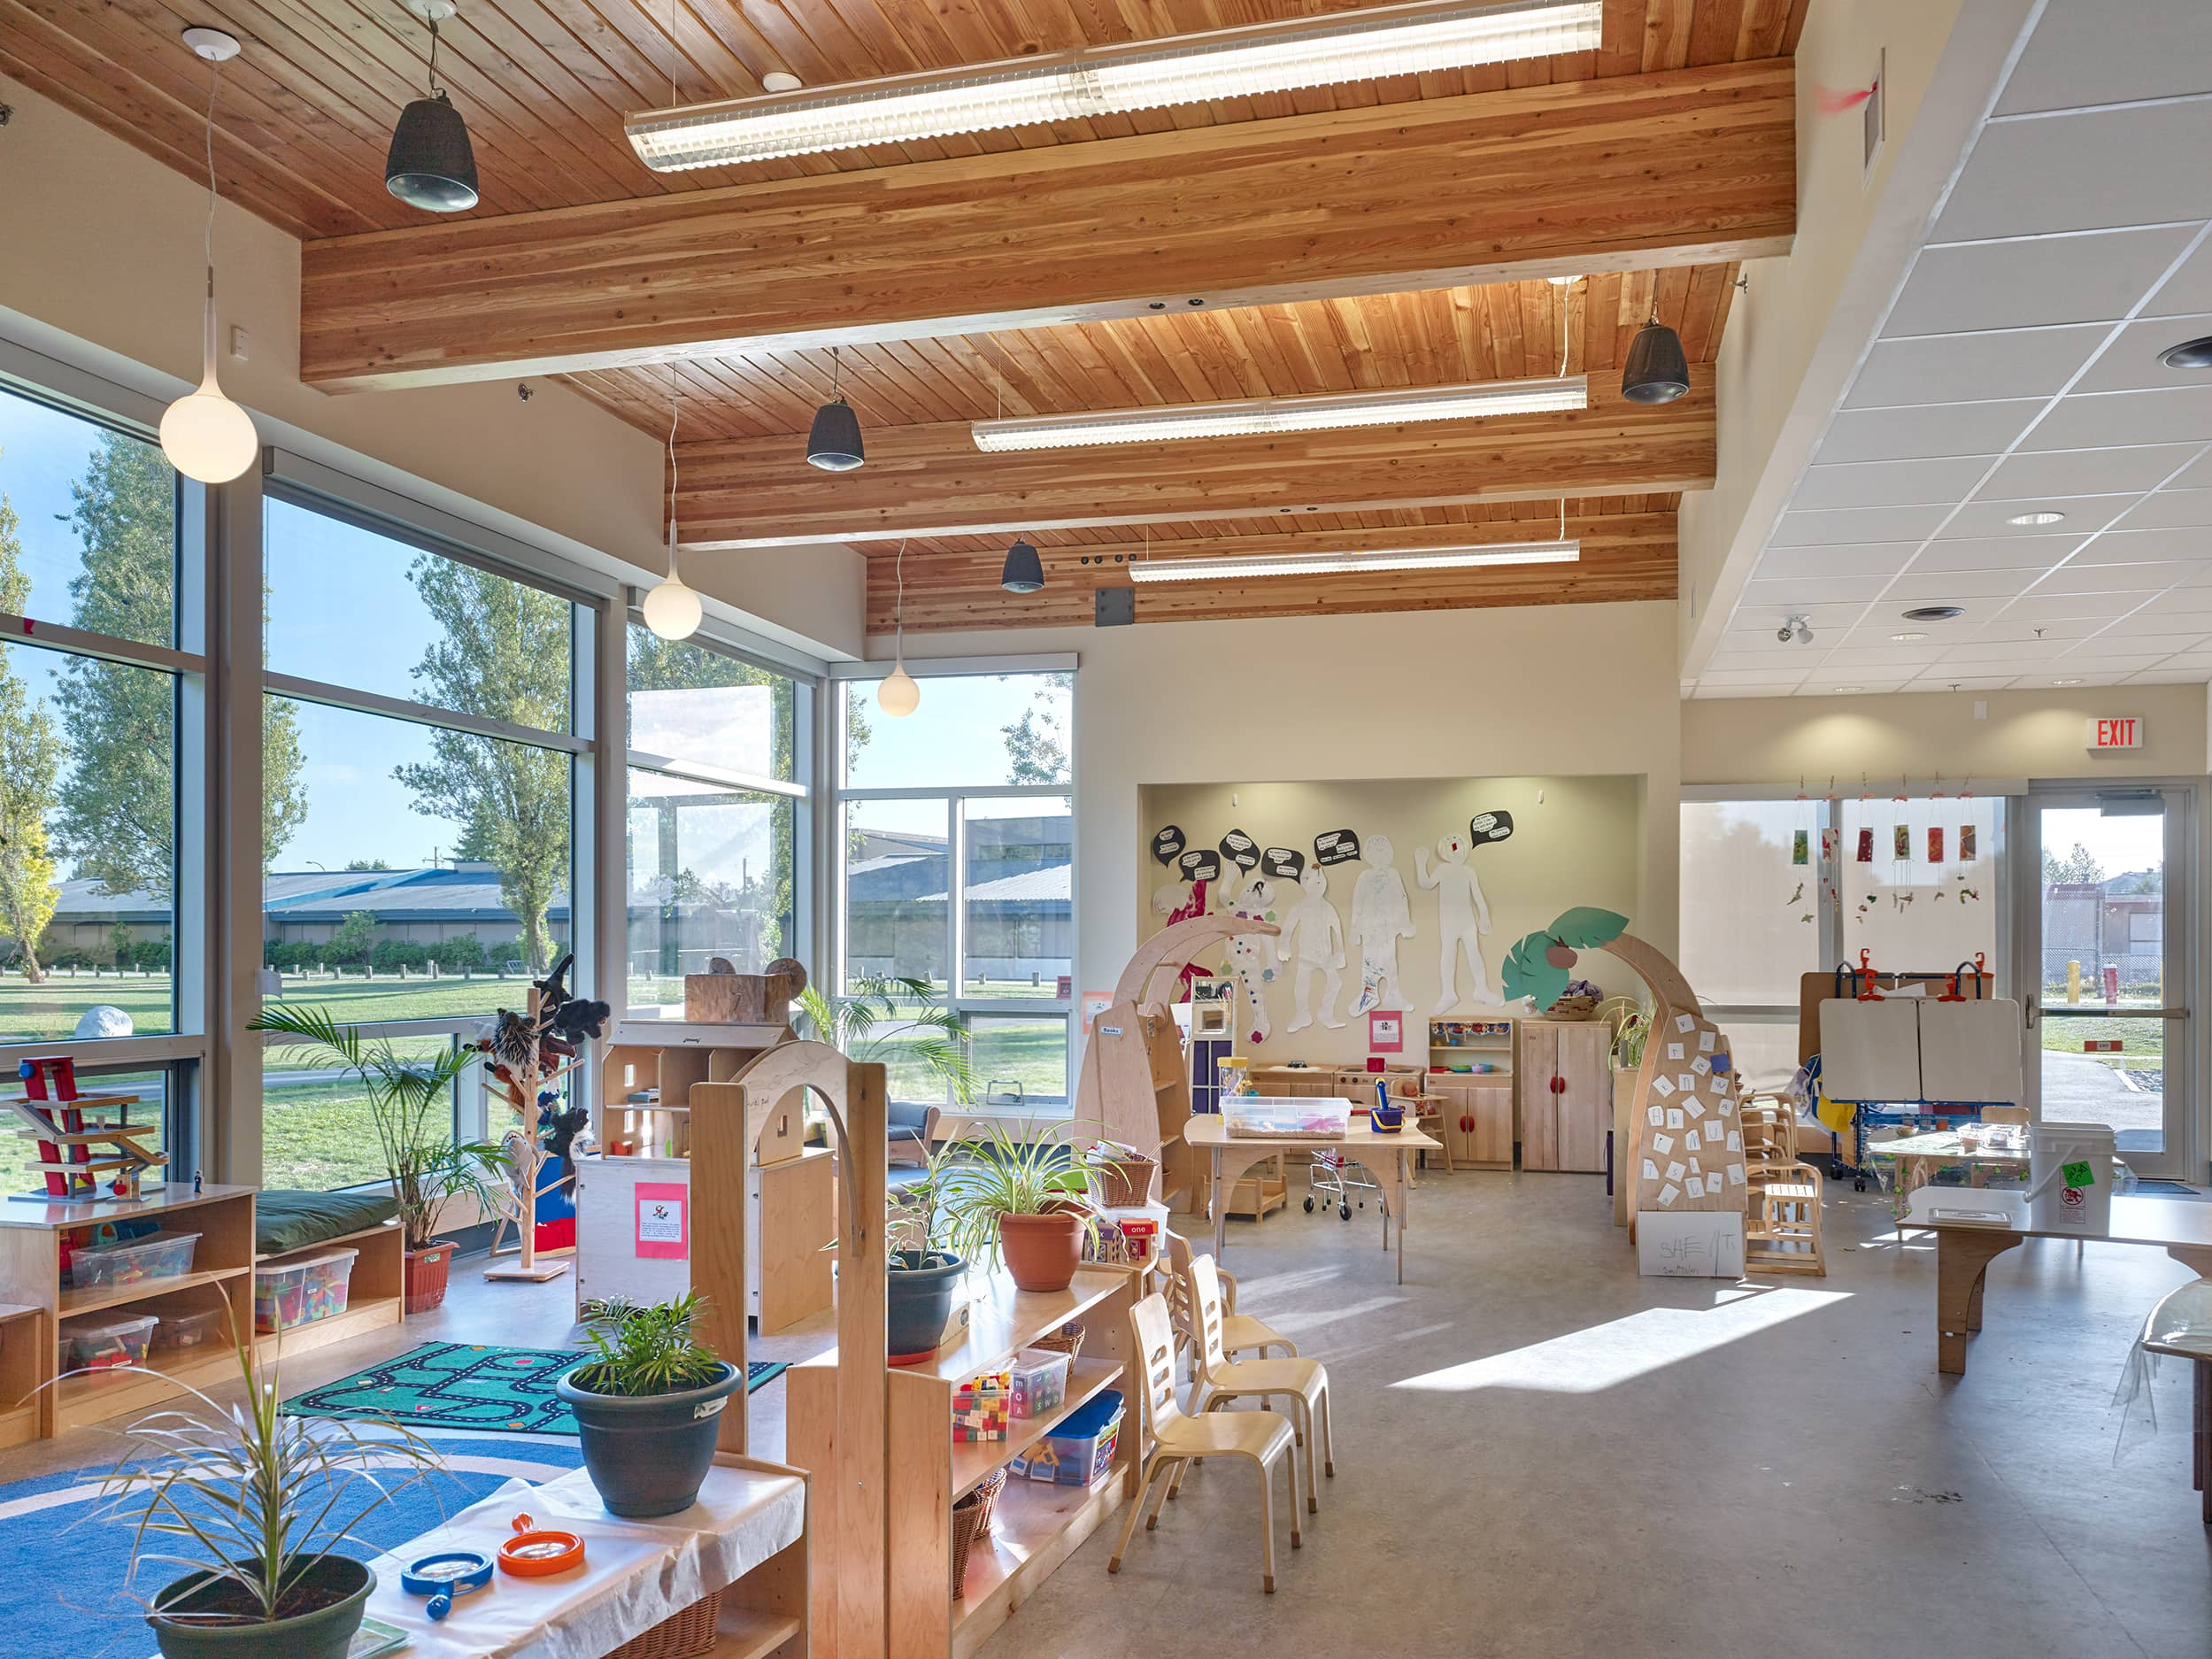 bbp queensborough community centre daycare